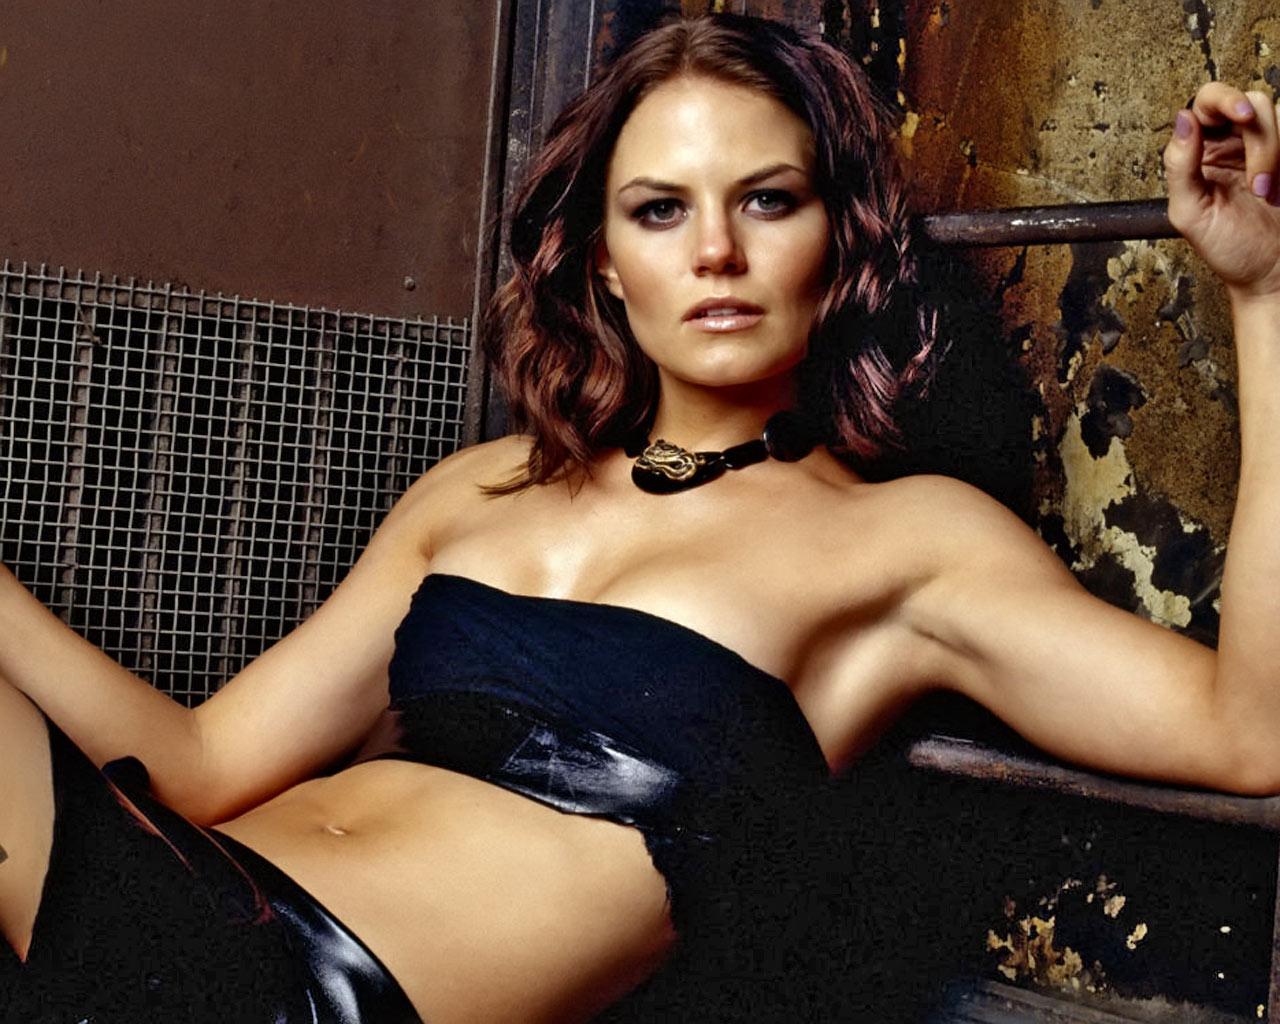 Jennifer morrison hot